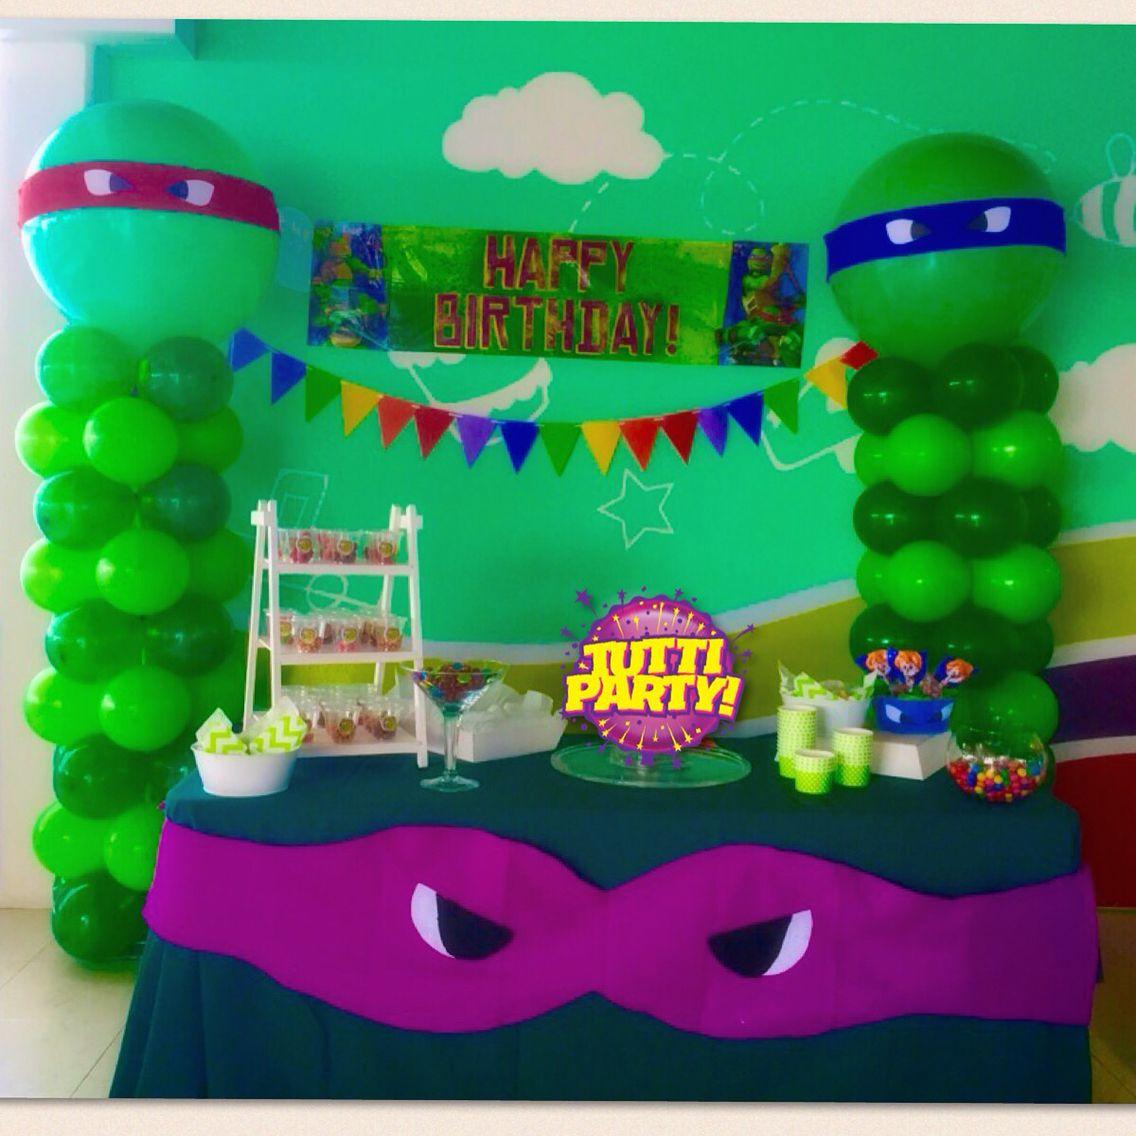 Tenage Mutant Ninja Turtles Balloons Decorations Tmnt Party Ideas Bis B Ninja Turtles Birthday Party Tmnt Birthday Teenage Mutant Ninja Turtles Birthday Party